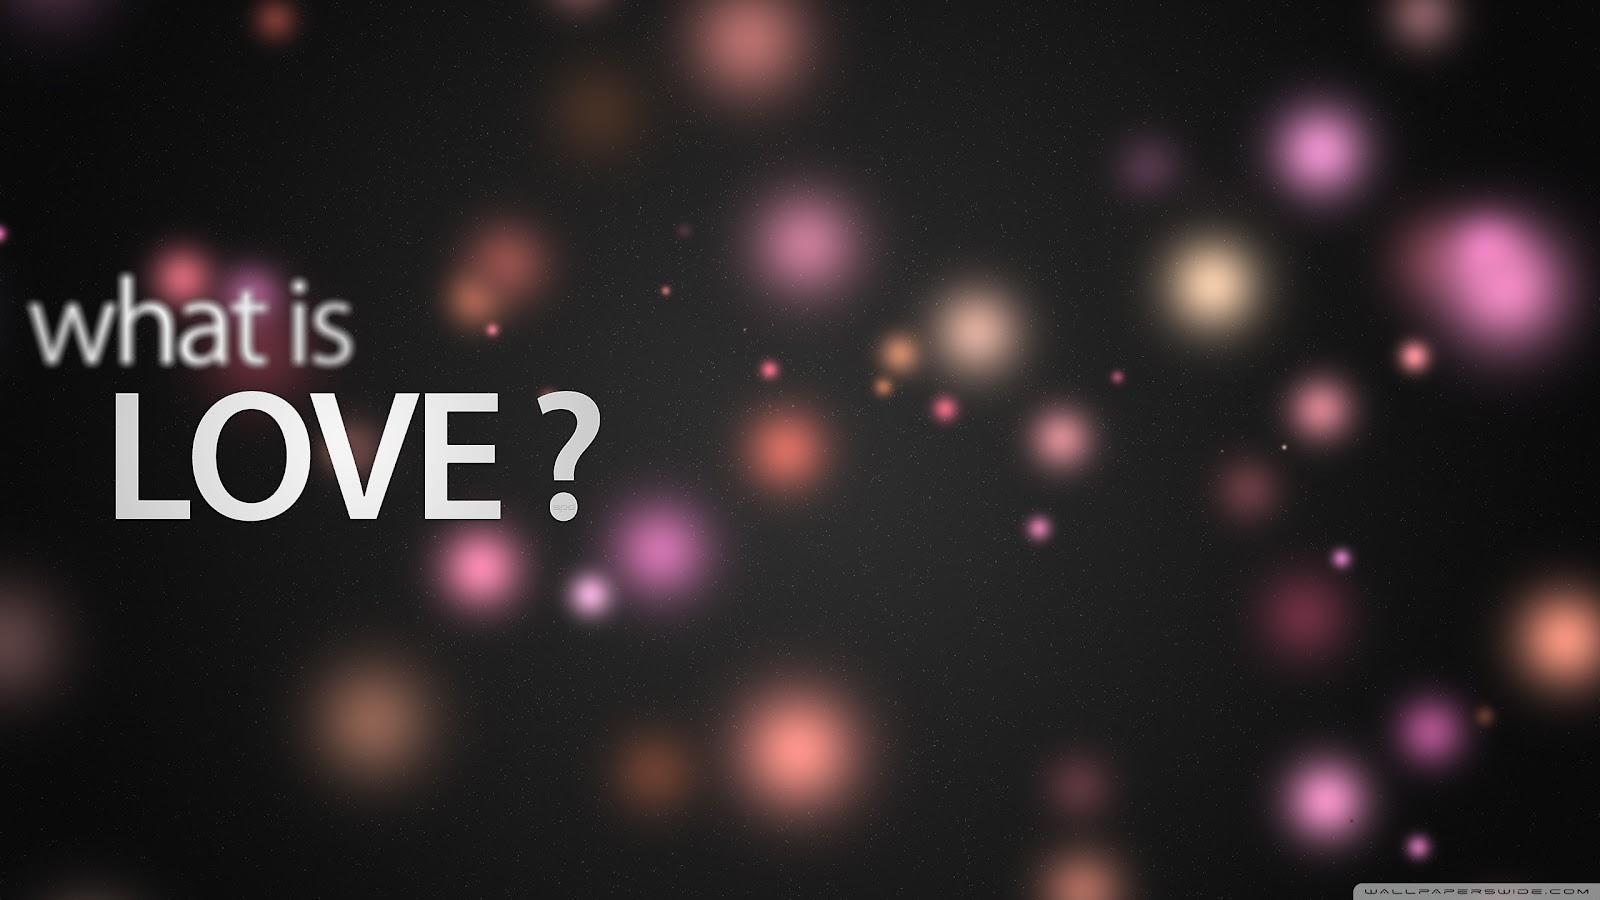 http://3.bp.blogspot.com/-doPdhkktO9w/TzKeuWUbX3I/AAAAAAAAAZQ/sp24GA-RYv8/s1600/what_is_love-wallpaper-2560x1440.jpg